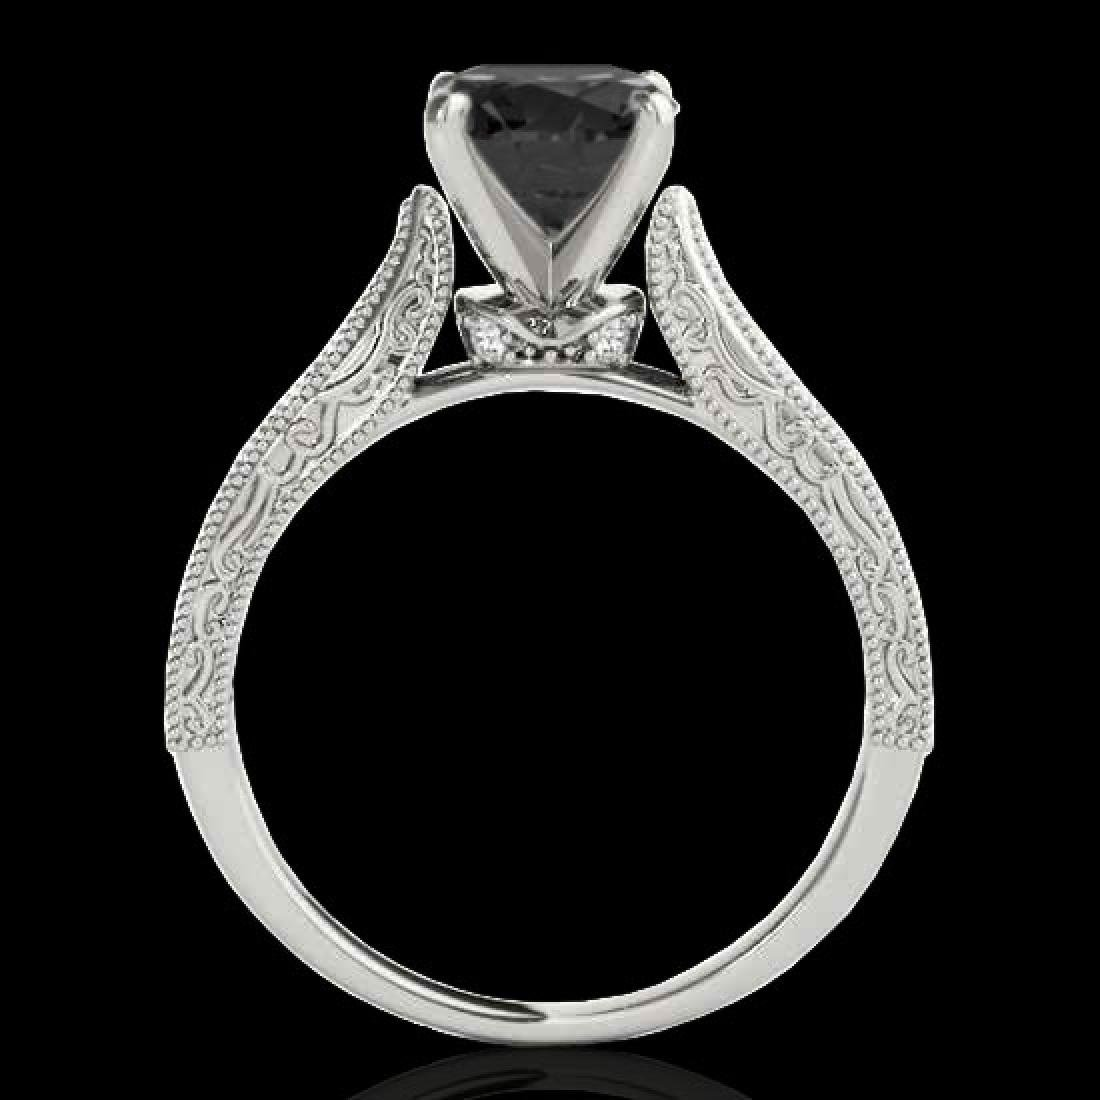 1.21 CTW Certified VS Black Diamond Solitaire Antique